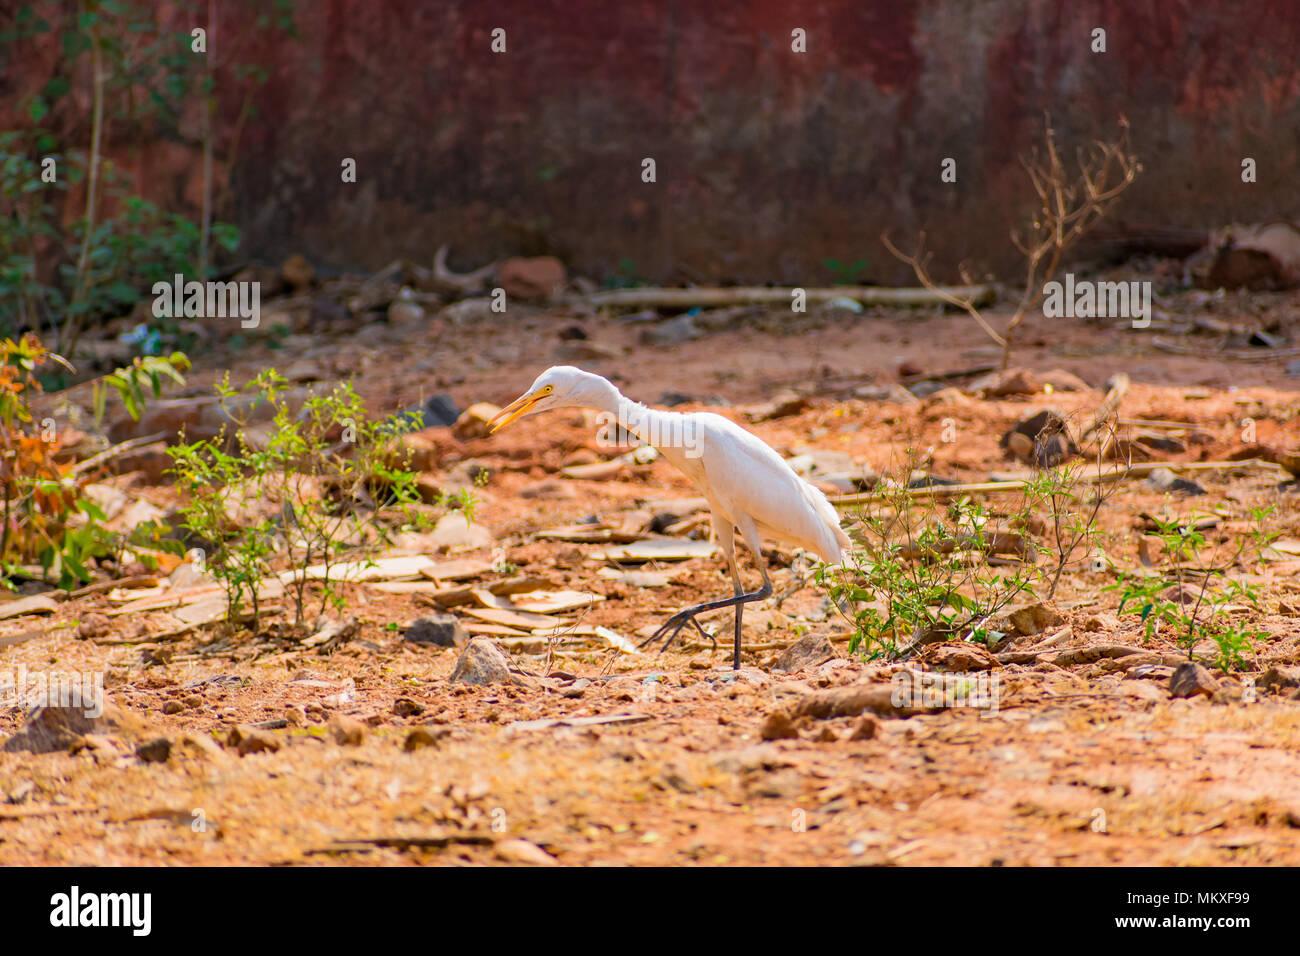 White egret bird at walking at zoo very good at sunny day. Stock Photo